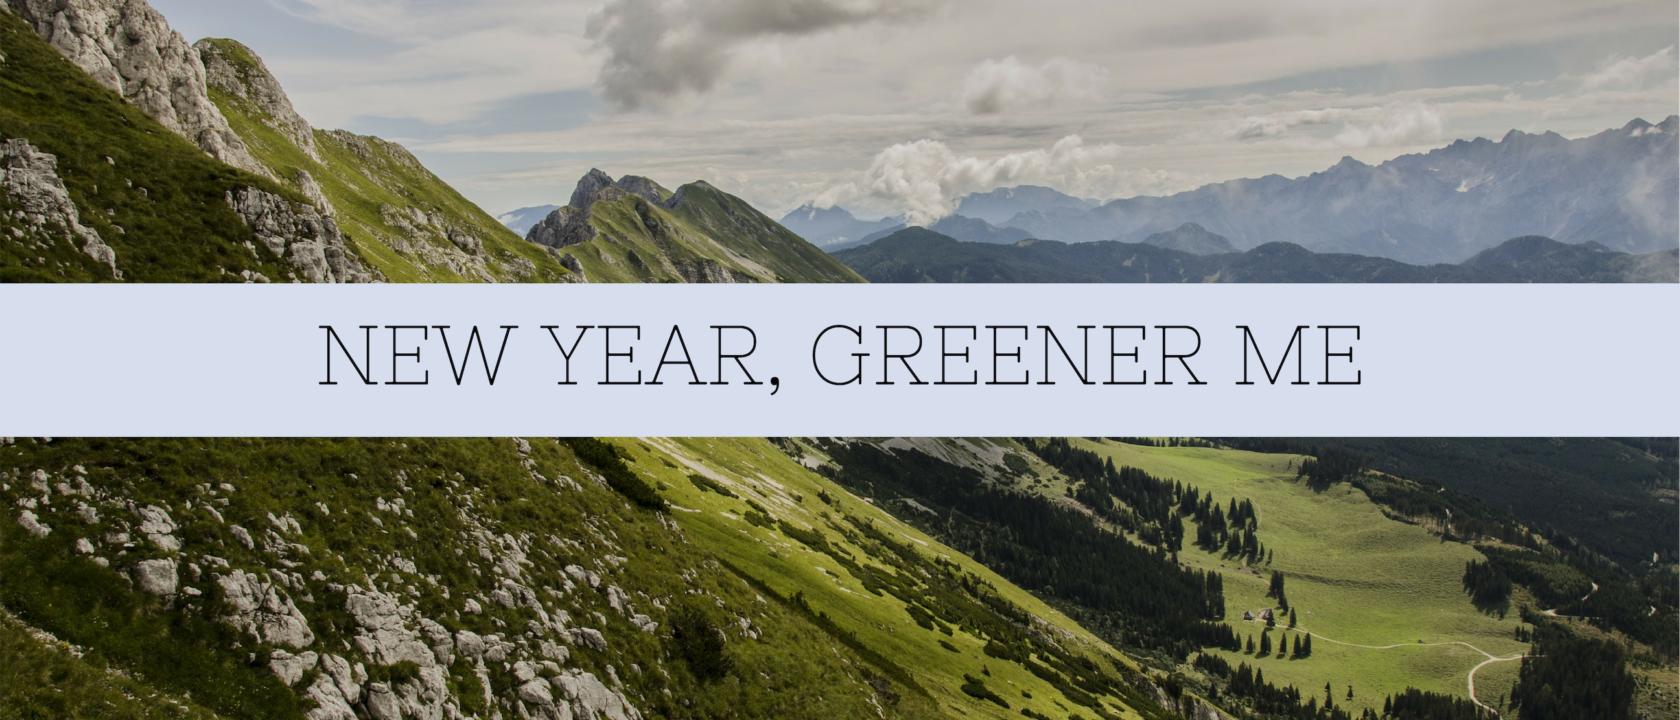 New Year, Greener Me